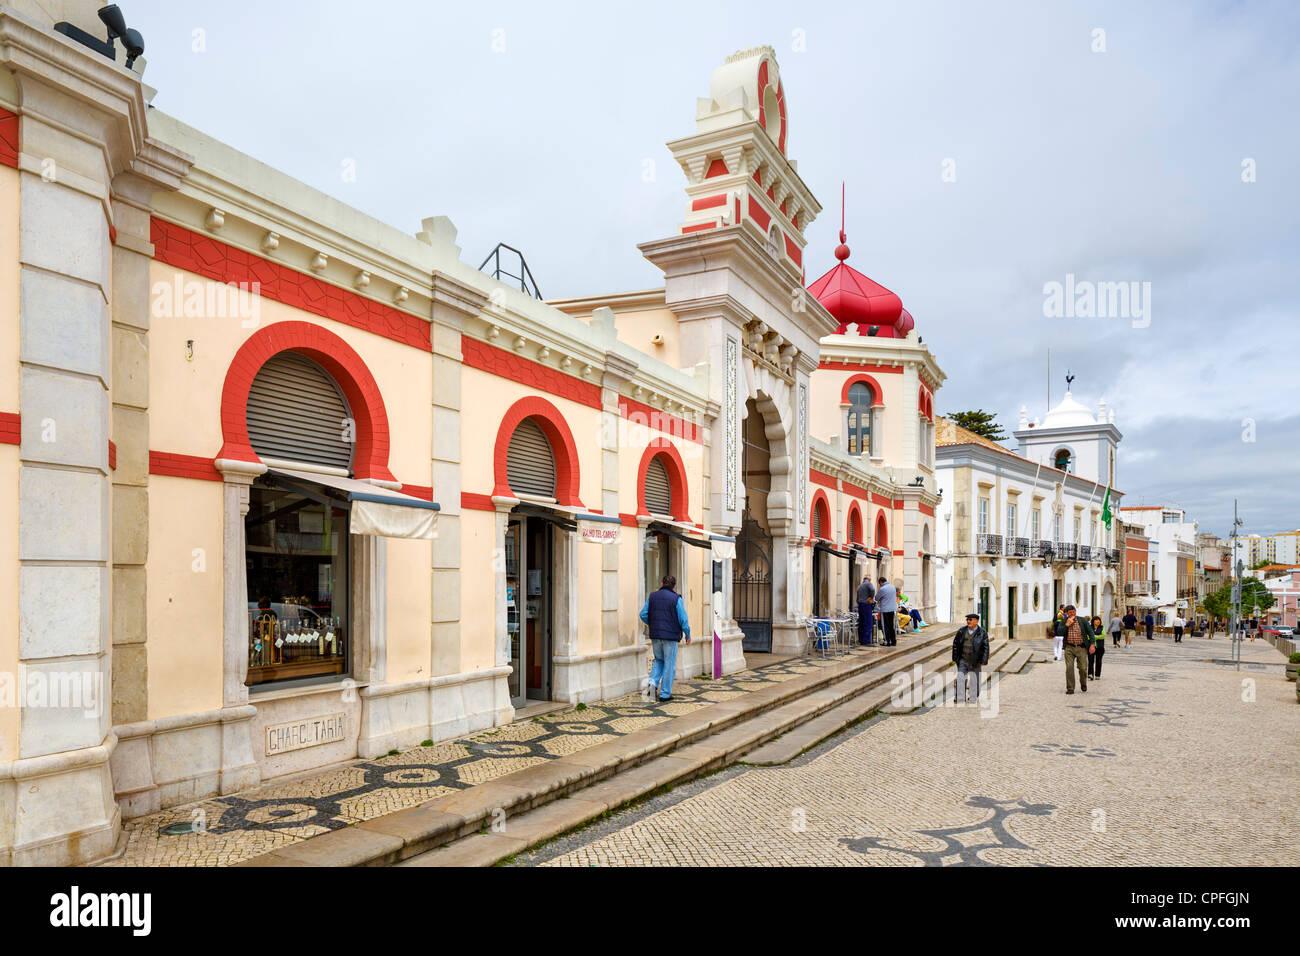 Markthalle in der Stadtzentrum, Rua Jose Fernandes Guerreiro, Loulé, Algarve, Portugal Stockbild